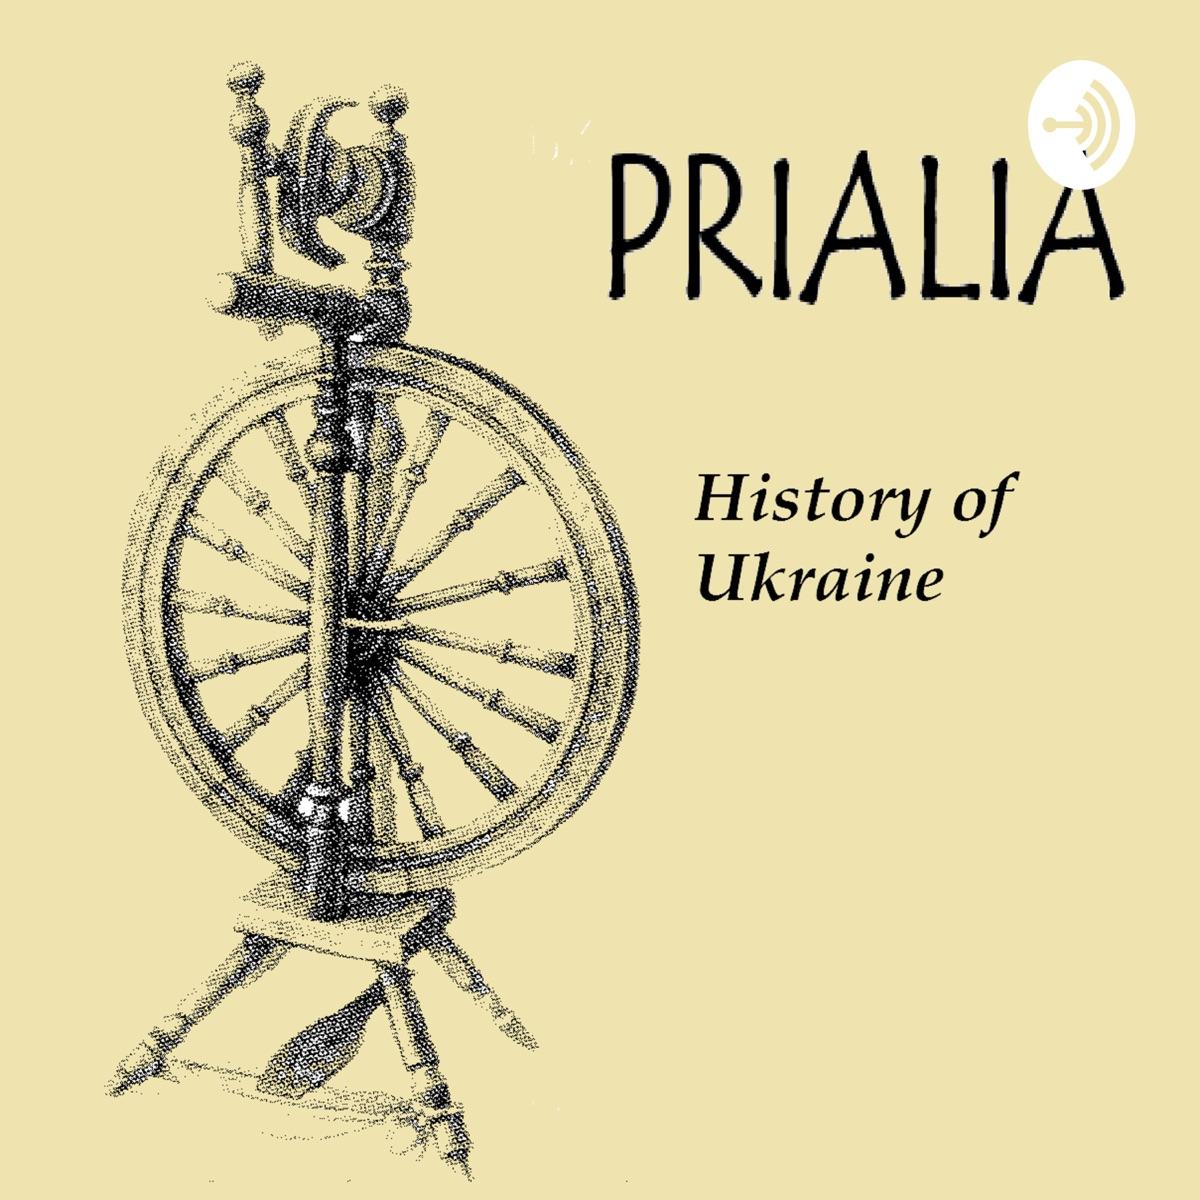 PRIALIA. The history of Ukraine